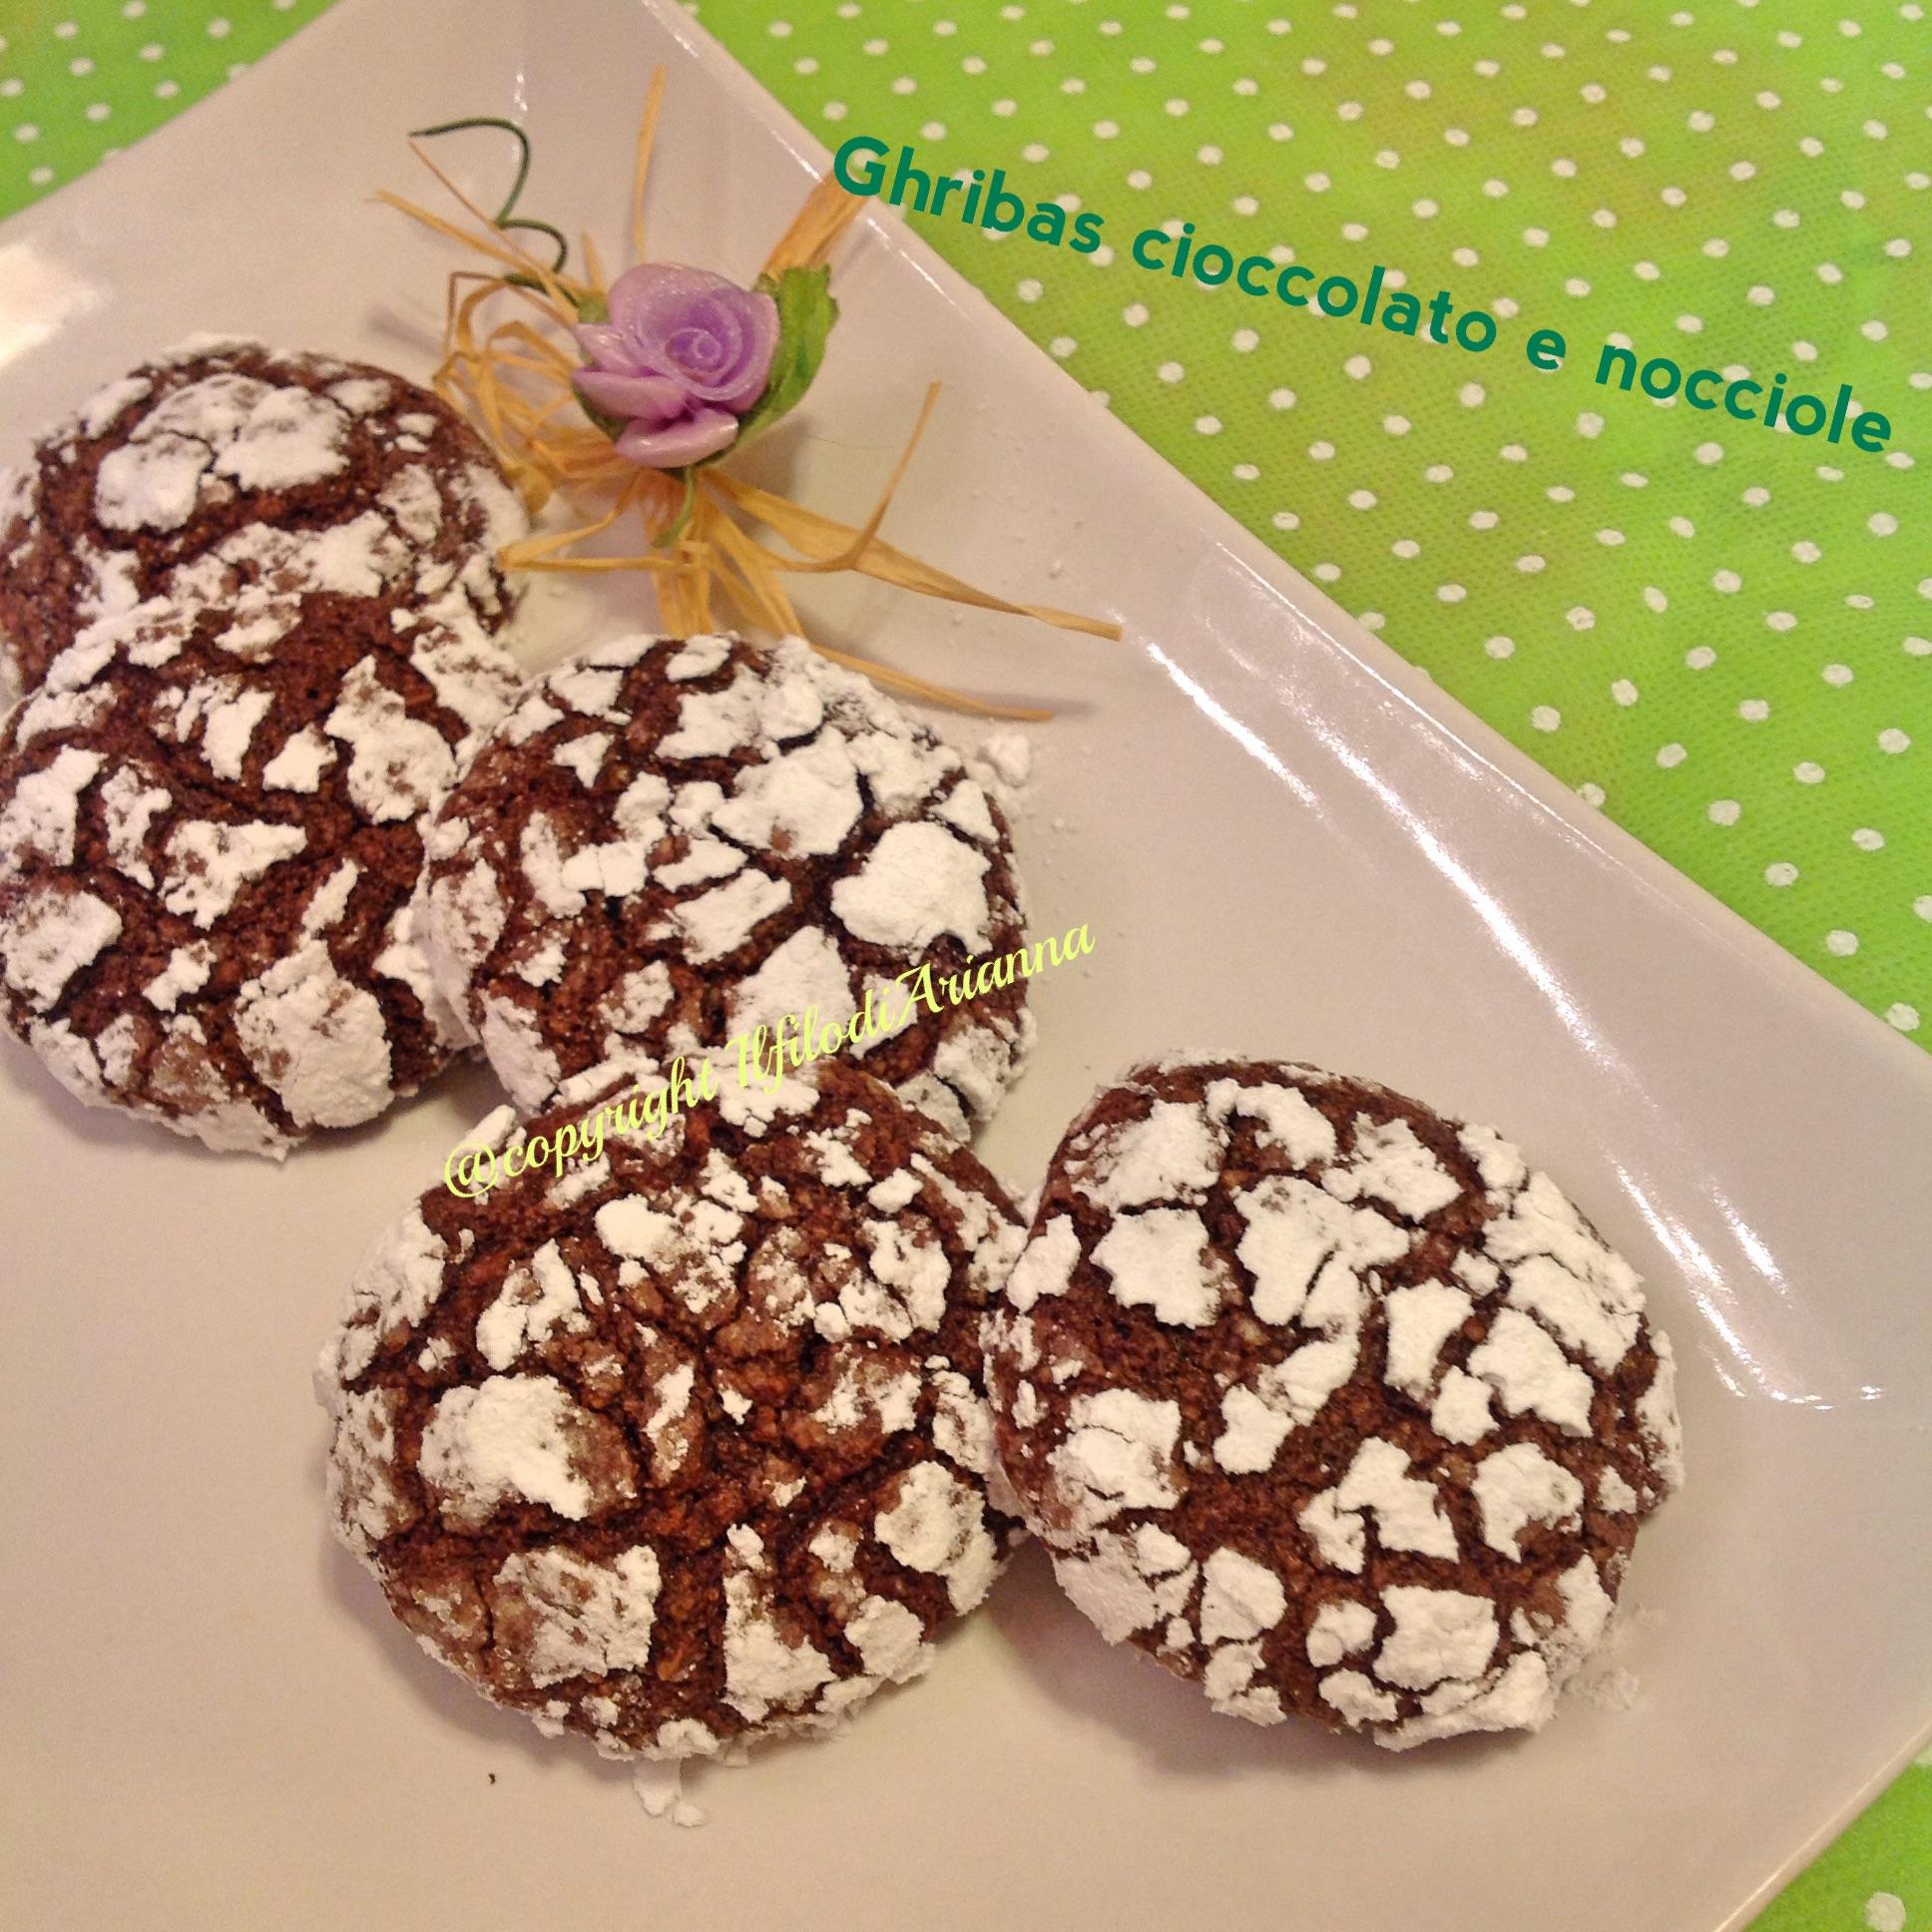 Ghribas cioccolato, nocciole e sesamo